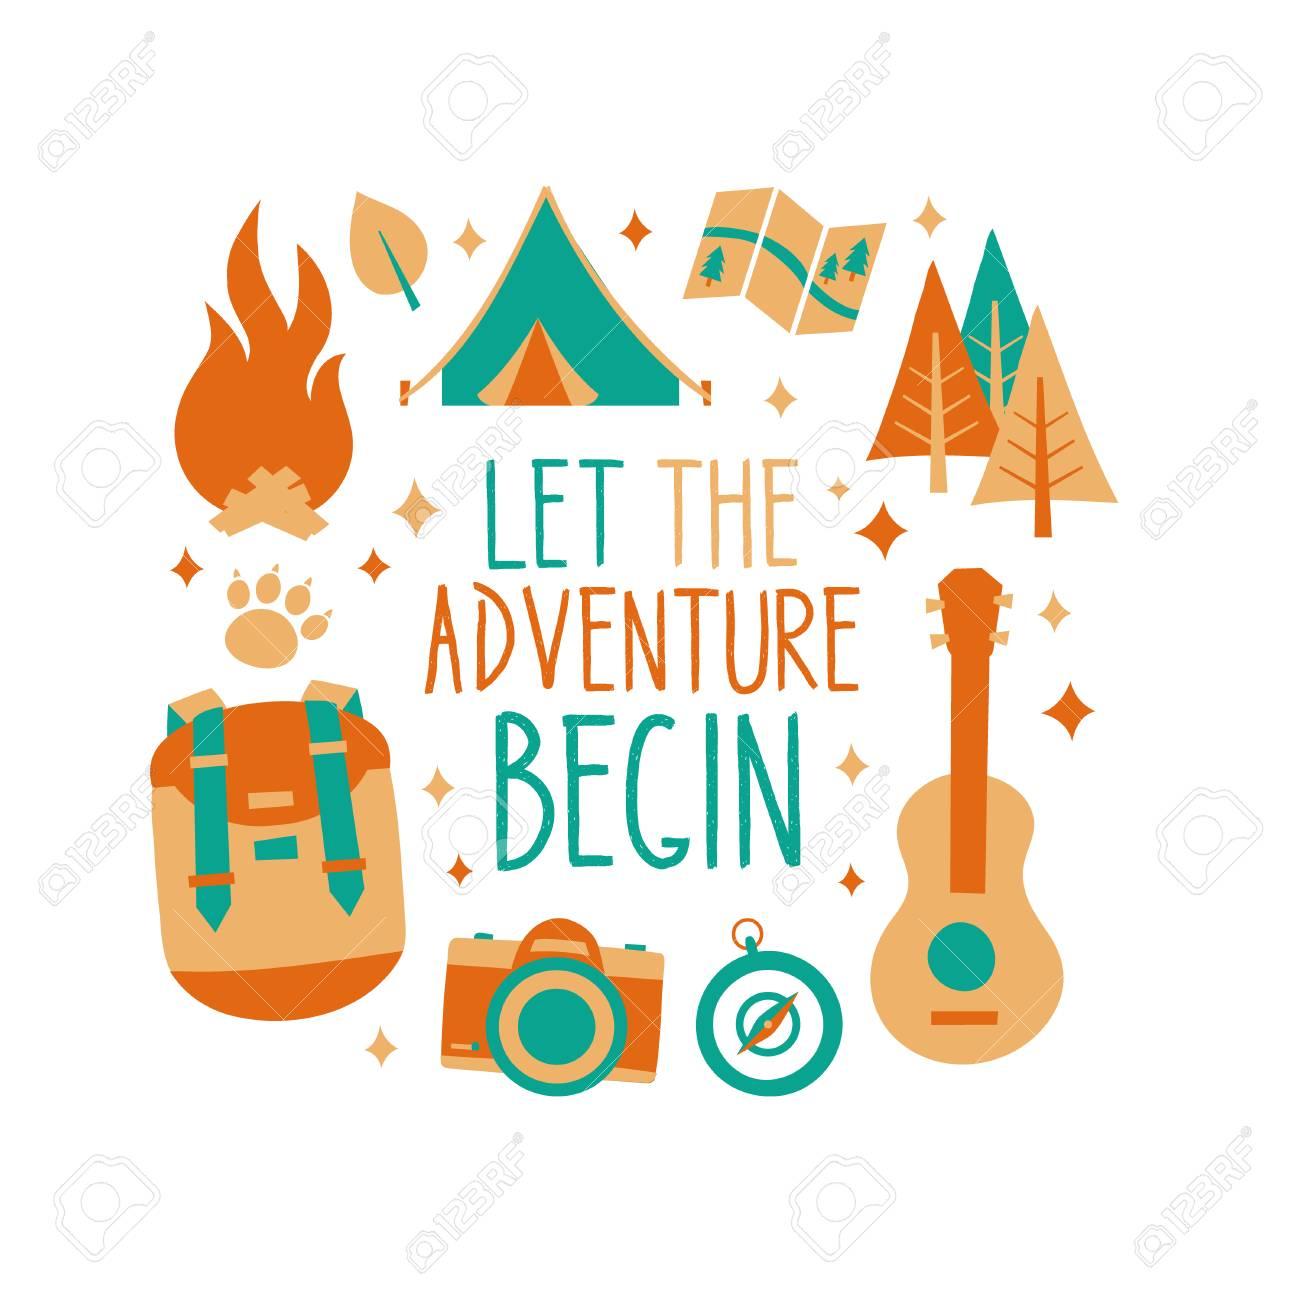 c6677a8a Let the adventure begin inscription card, t-shirt print design. Hipster  nature travel